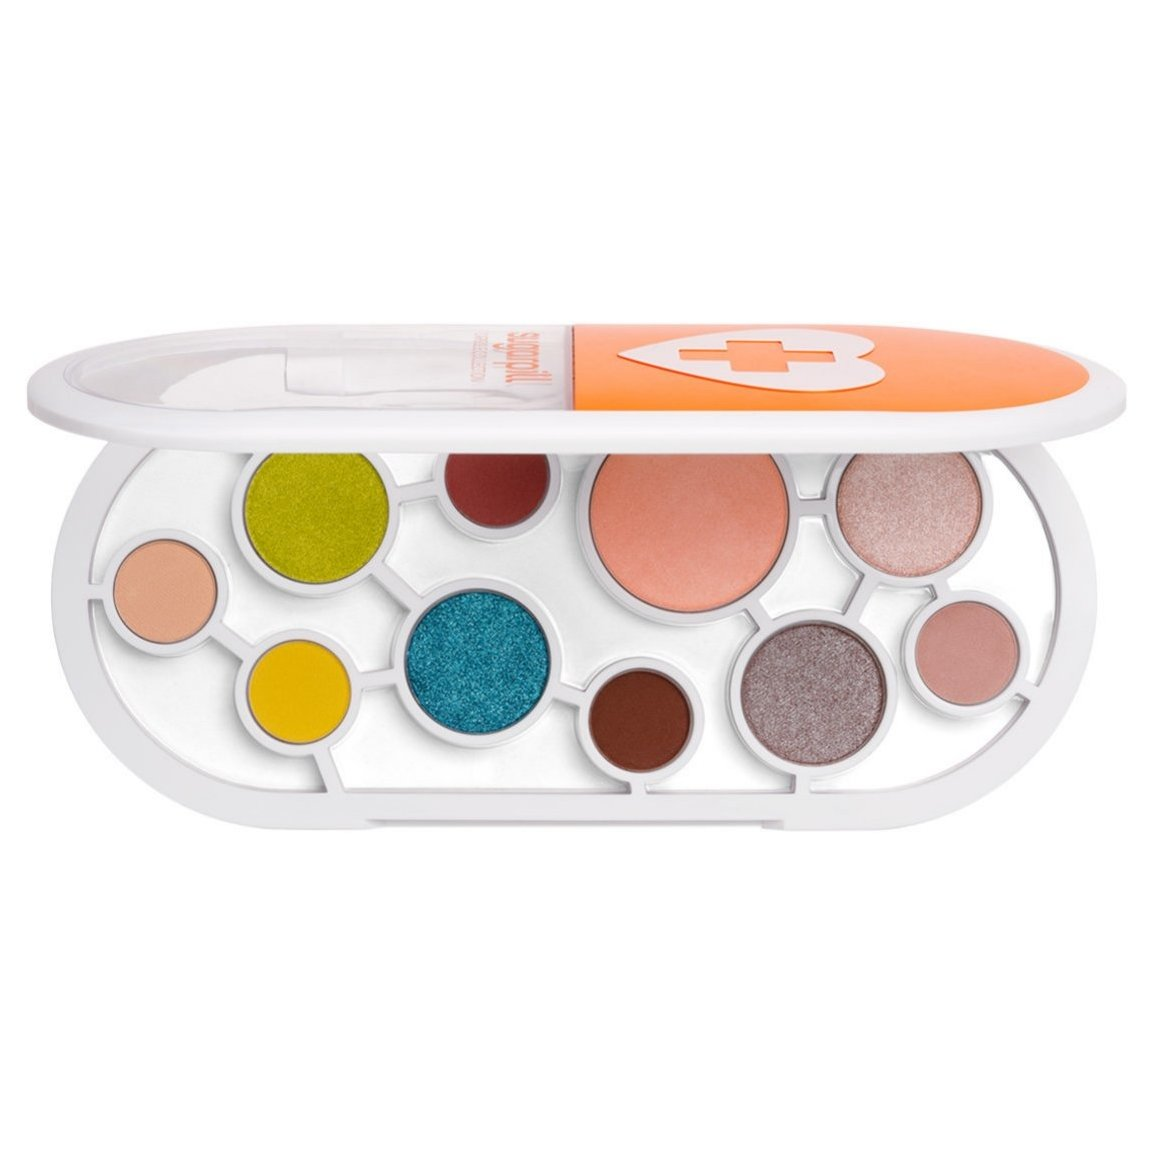 Sugarpill Cosmetics Capsule Collection Orange Edition alternative view 1 - product swatch.